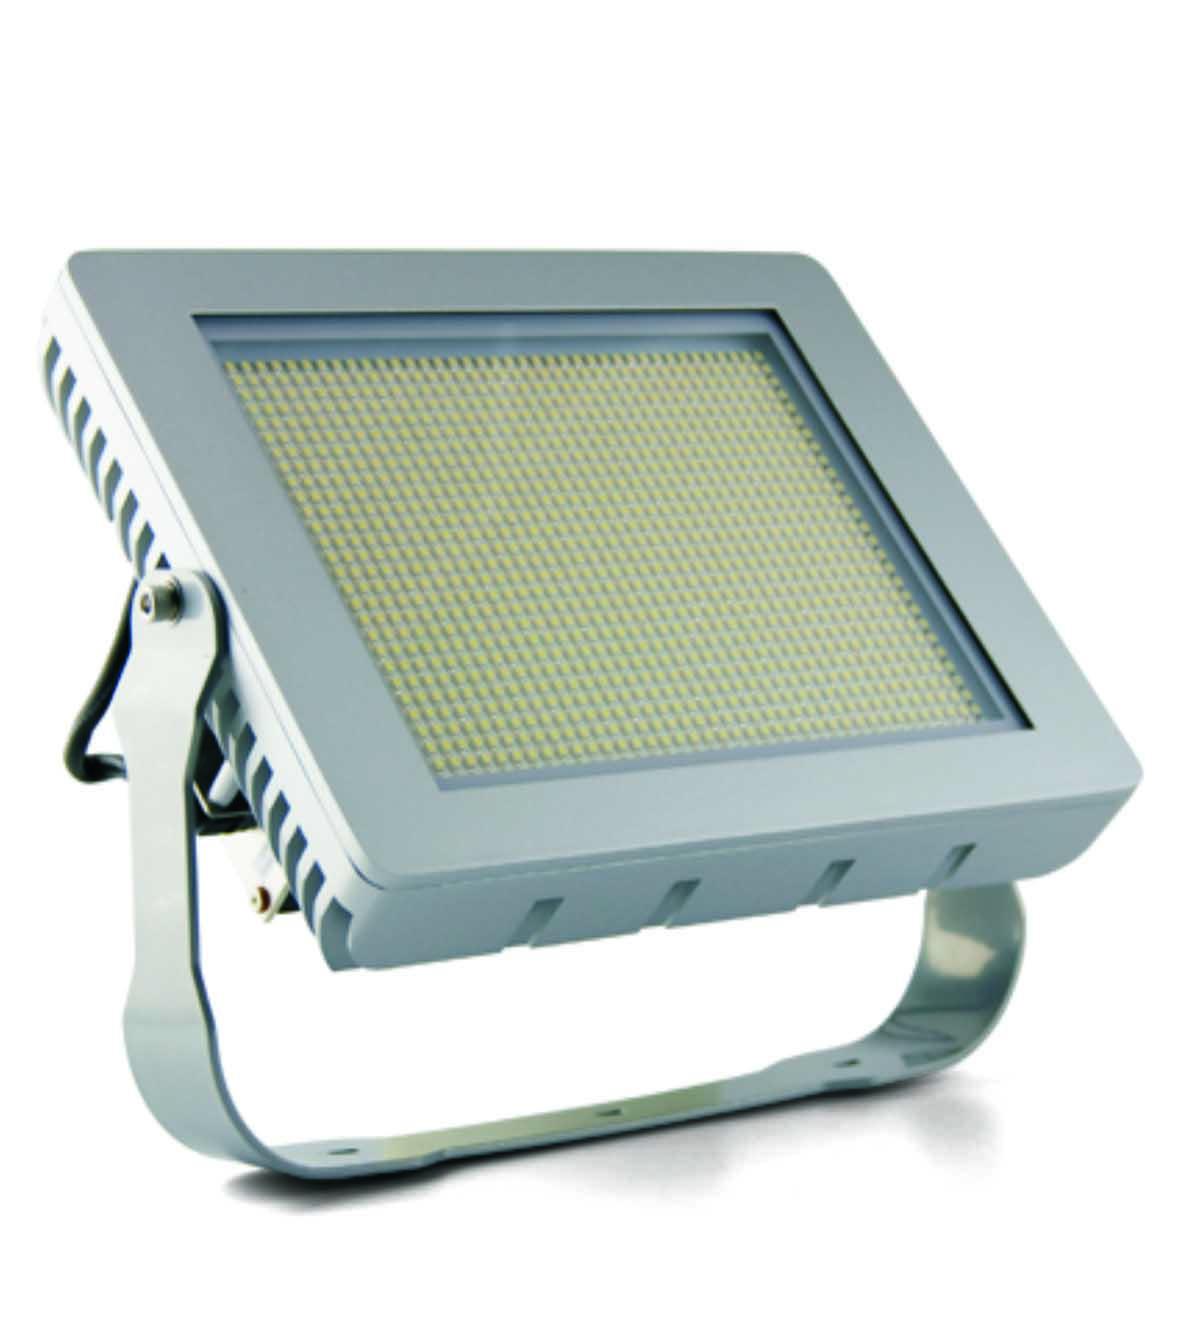 پروژکتور 70 وات LED